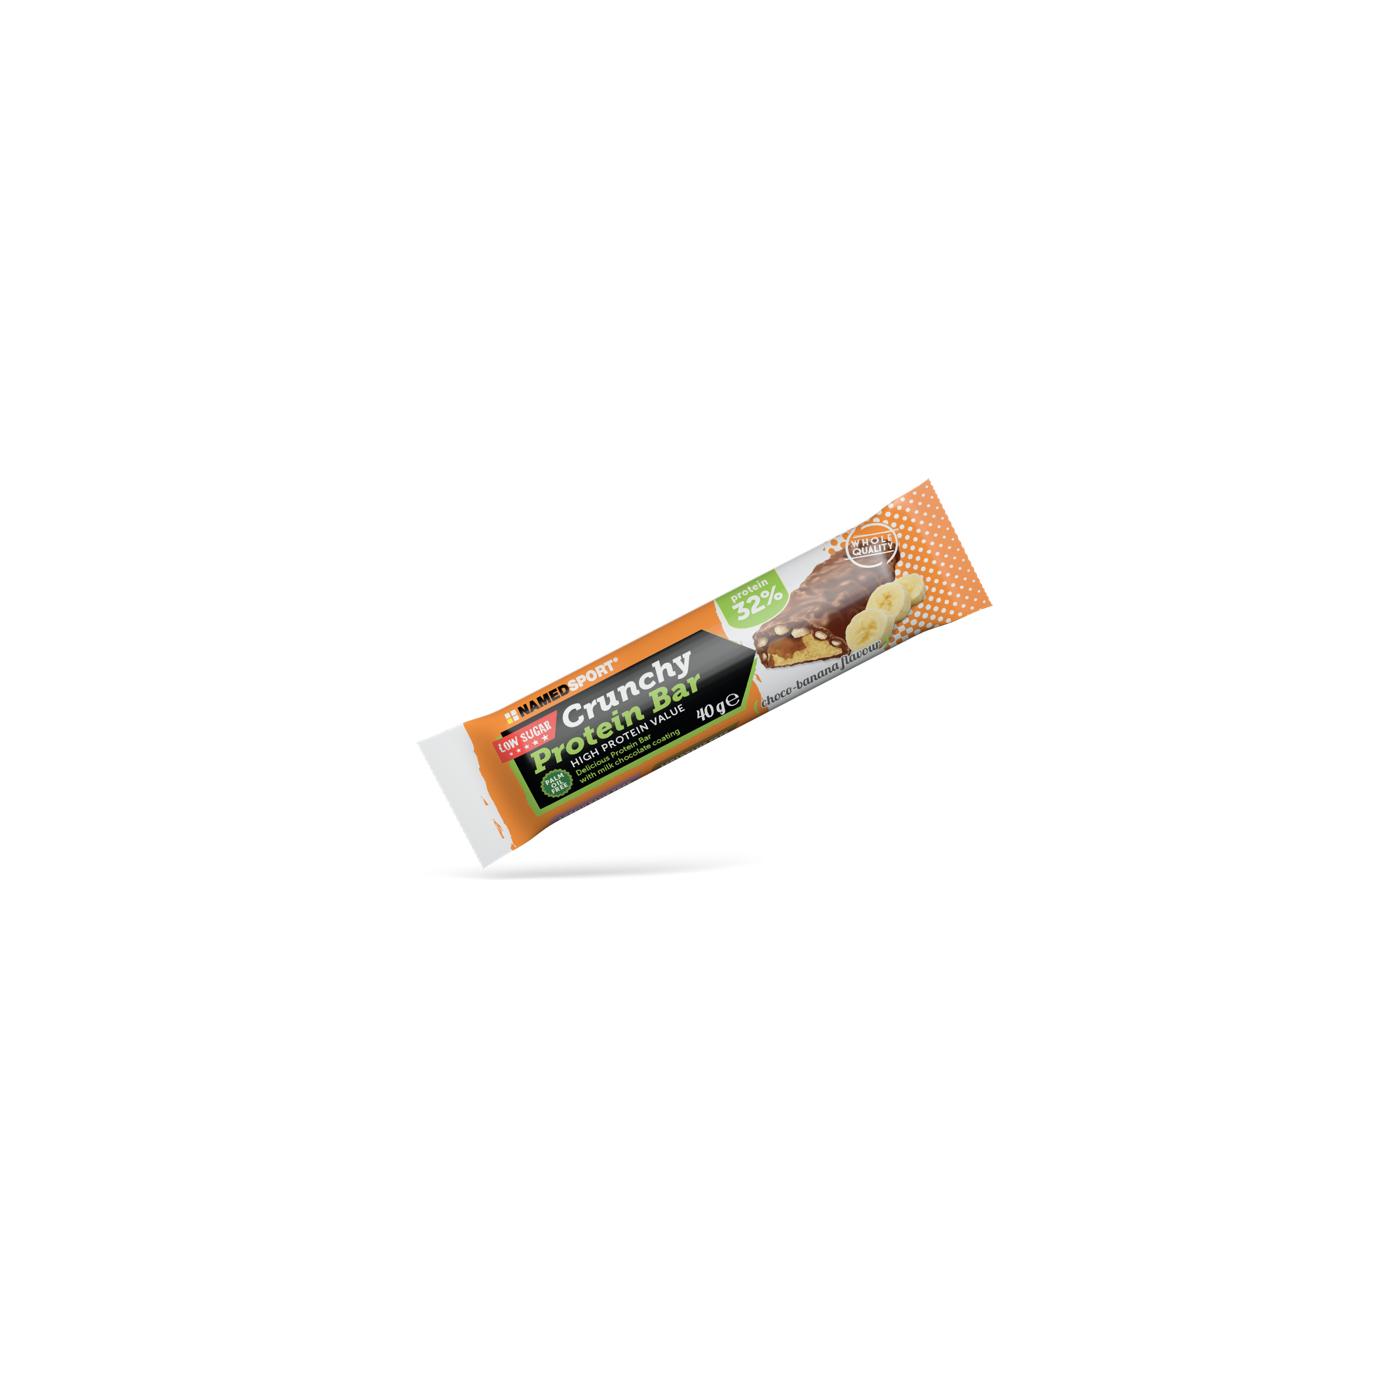 Garlando   Lampada LED con attacco a clip   Mad Sport Nutrition  u0026 Wellness -> Lampada Clip Led